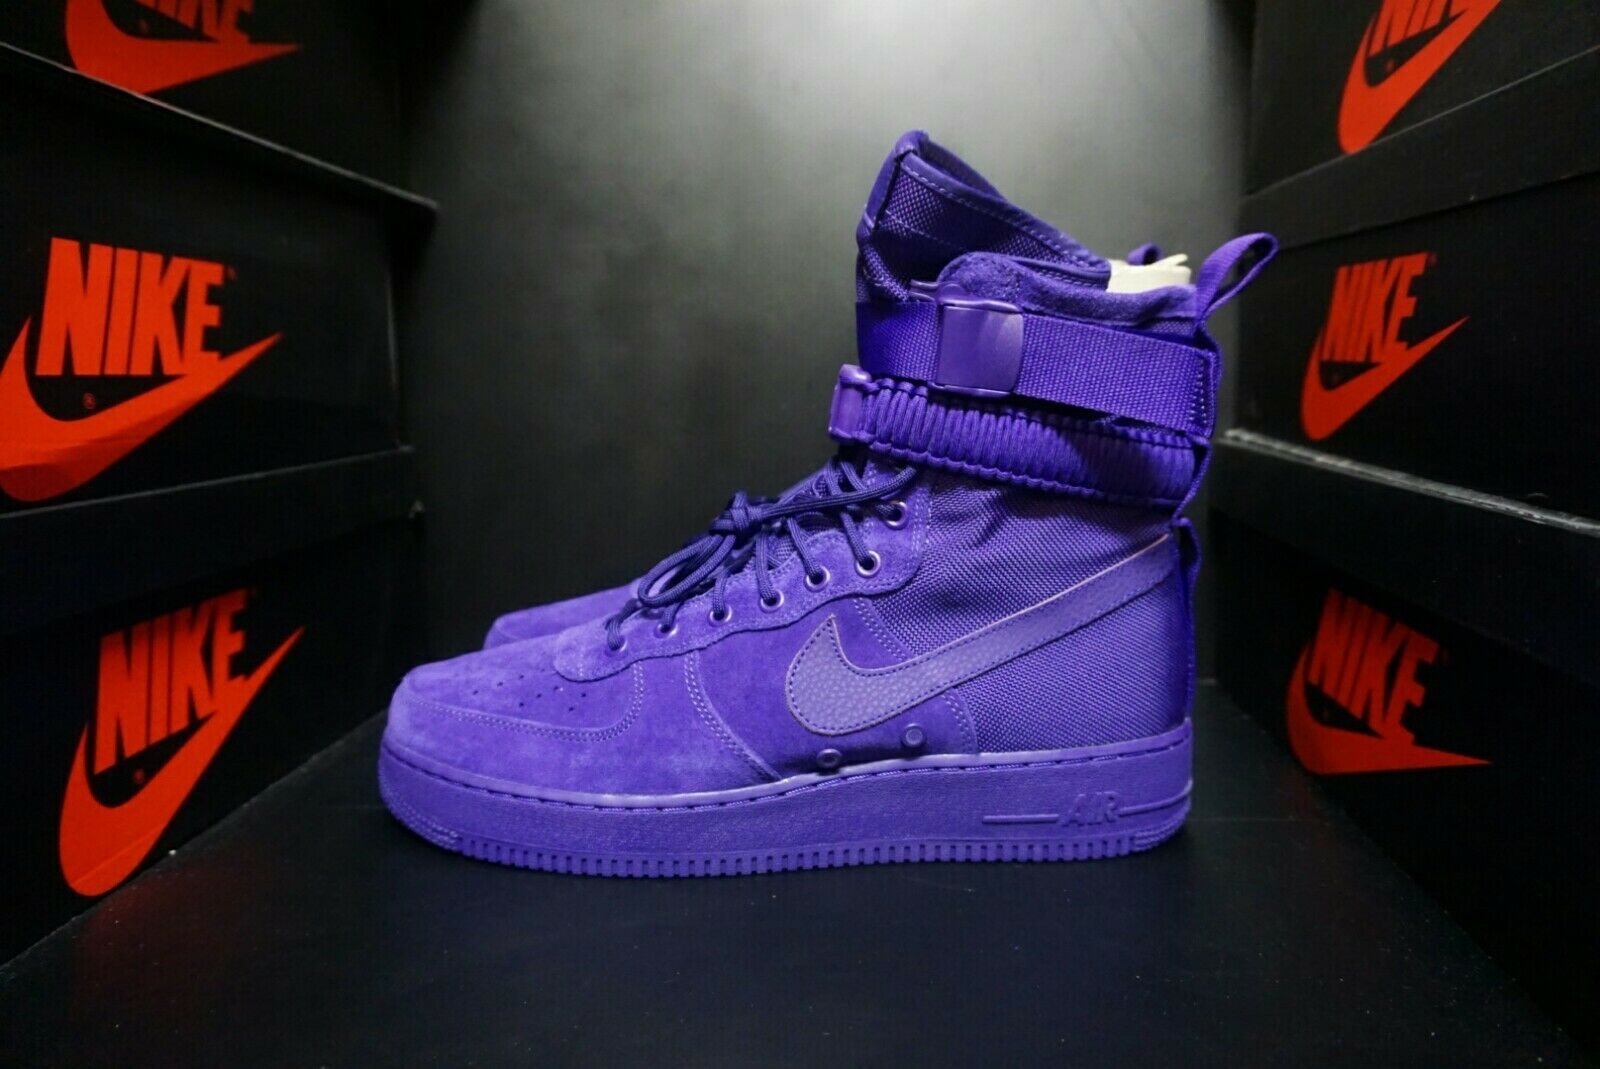 Nike SF AF 1 Air Force 1 Court Purple Suede  Size US 12 Men 864024 500 NO BOX